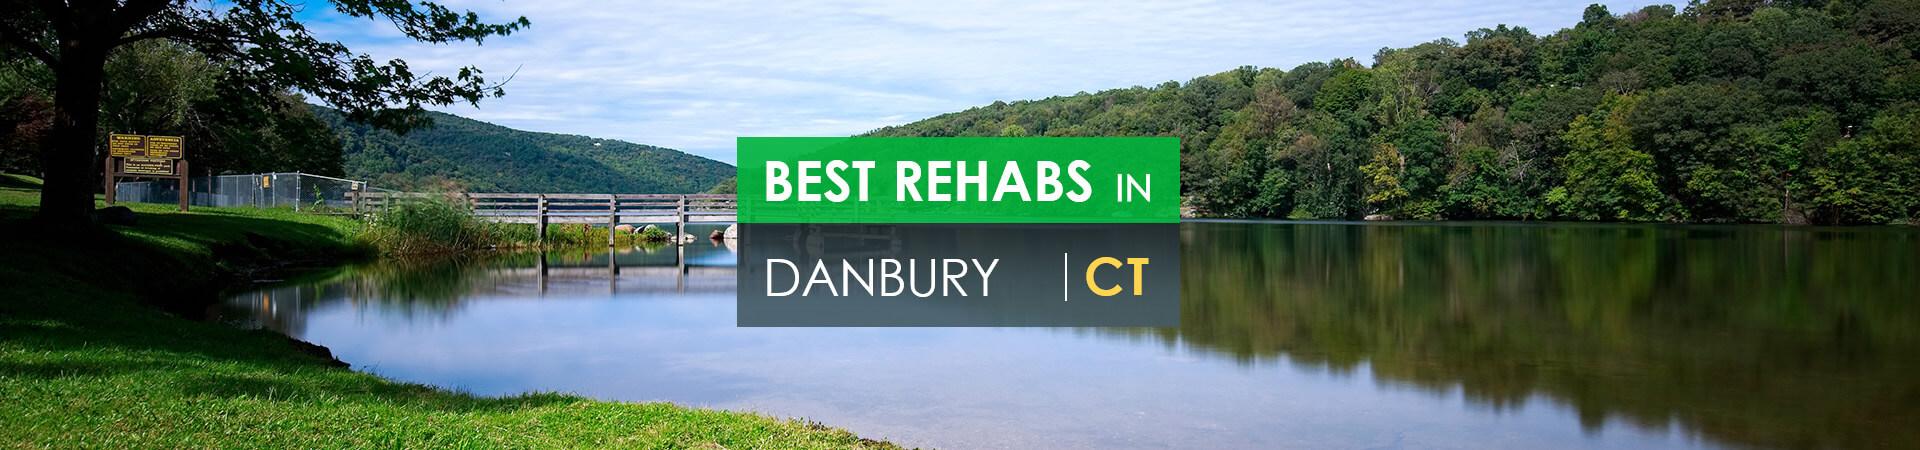 Best rehabs in Danbury, CT